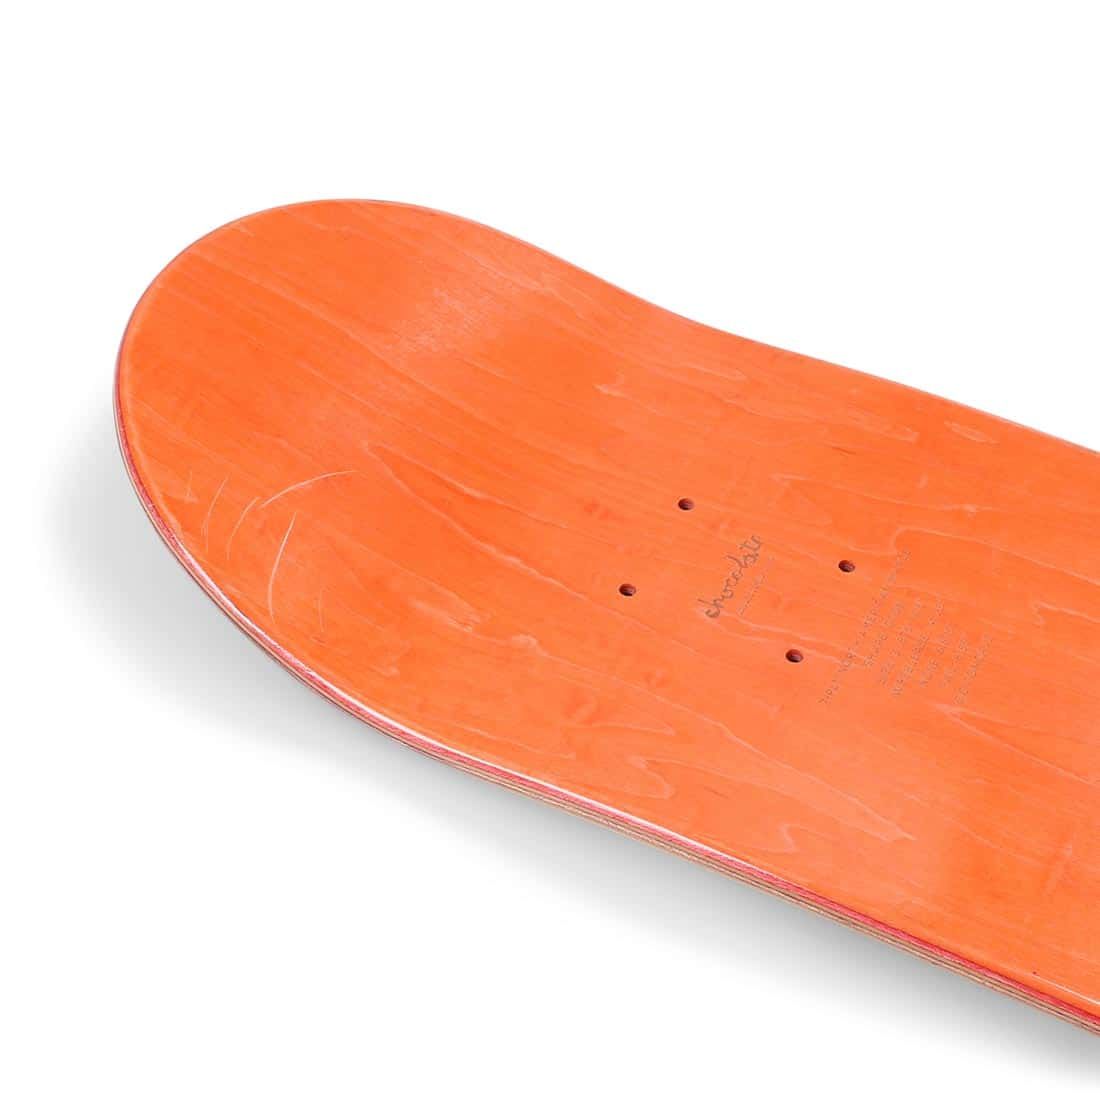 "Chocolate Skateboards Original Chunk W36 Vincent Alvarez 8"" Deck"